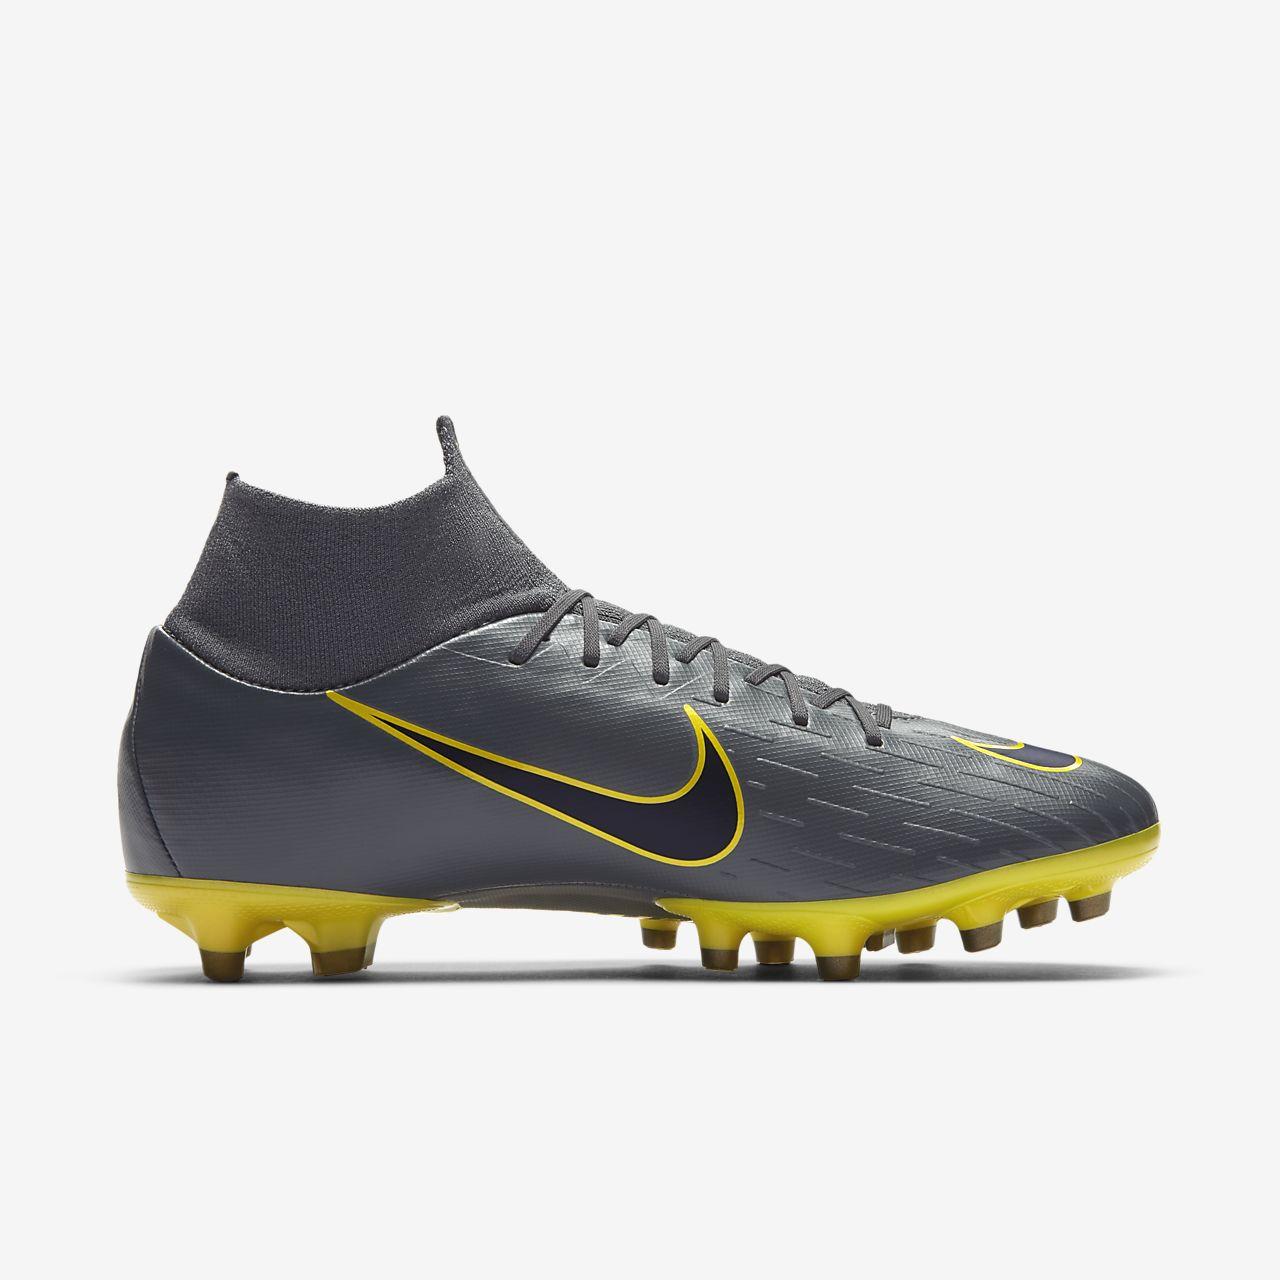 competitive price fee5f f1f65 ... Fotbollsko för konstgräs Nike Mercurial Superfly VI Pro AG-PRO